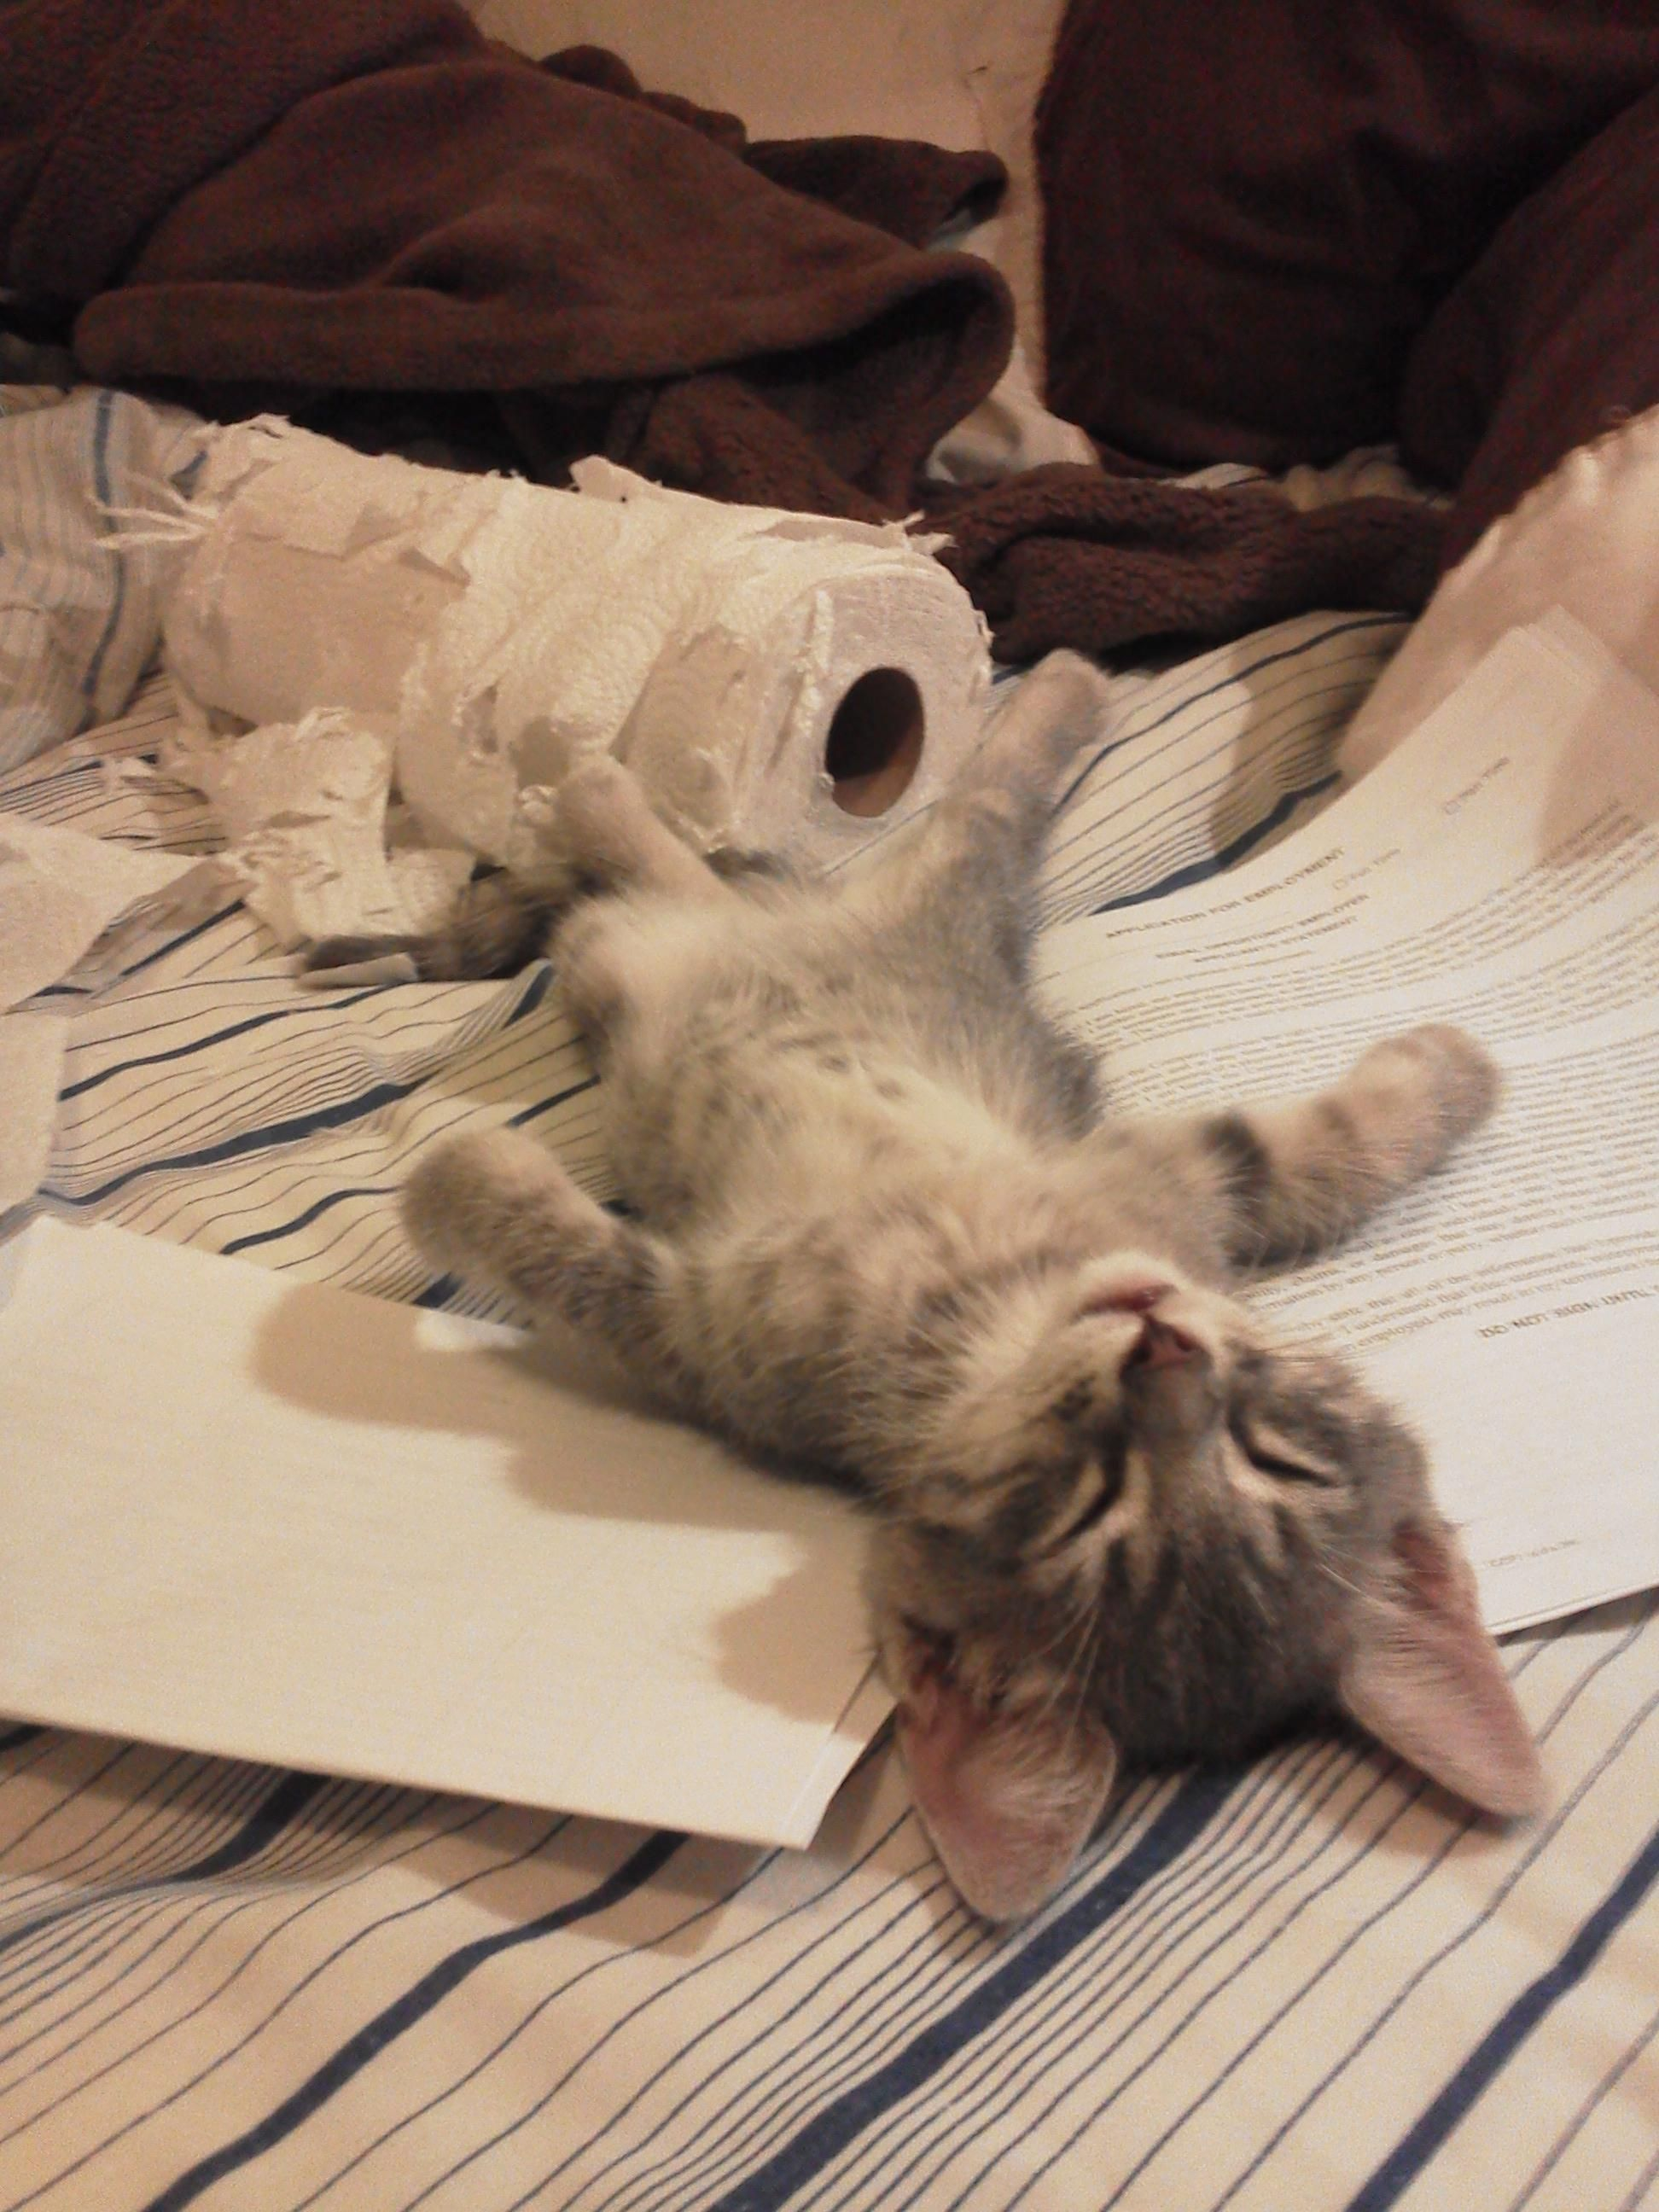 After A Hard Days Work Cute Animals Kittens Cutest Cute Cats